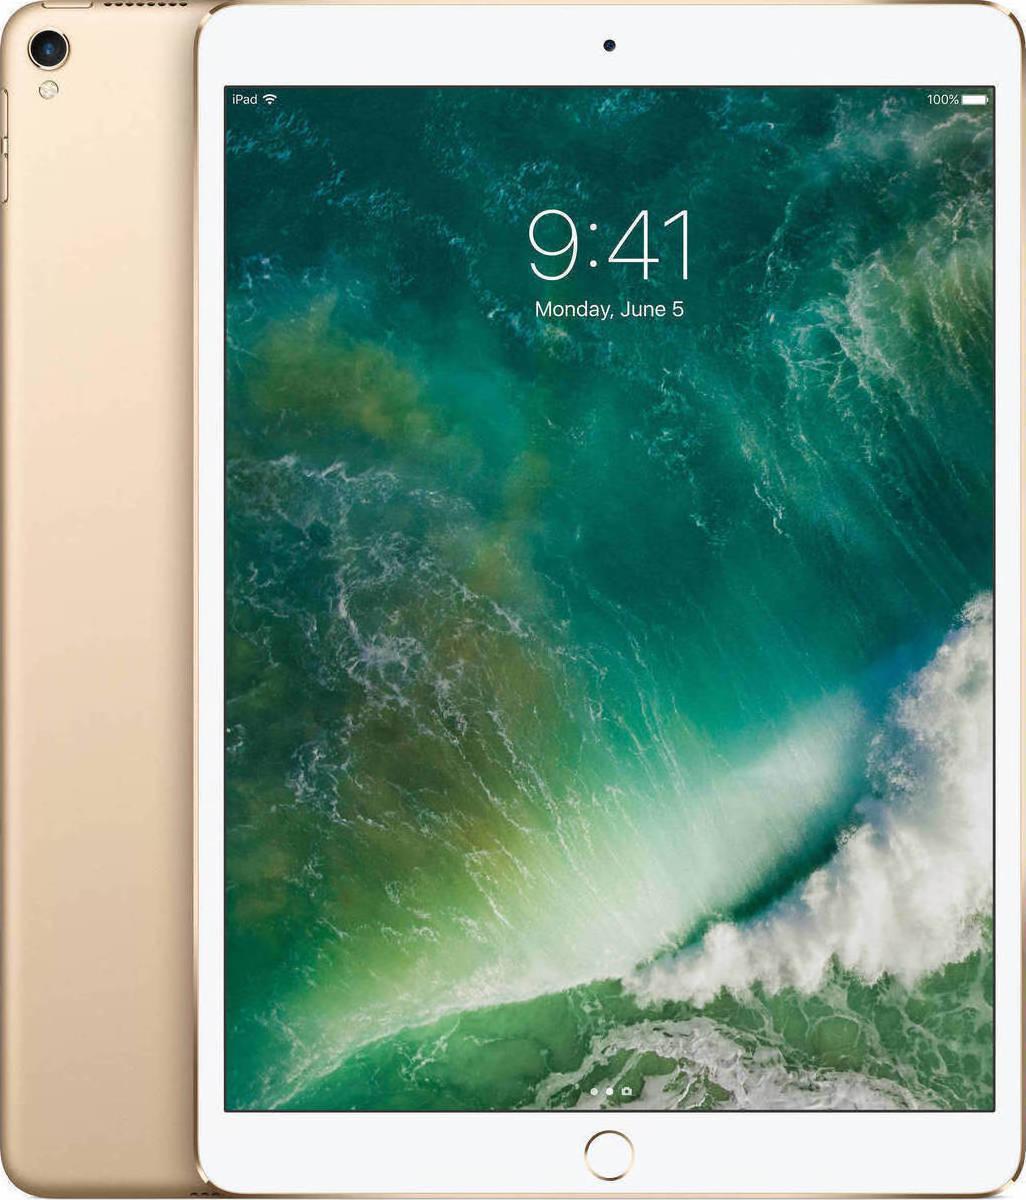 Apple iPad Pro 12.9'' 2017 WiFi and Cellular 512GB Gold Με Αντάπτορα Πληρωμή έως 24 δόσεις